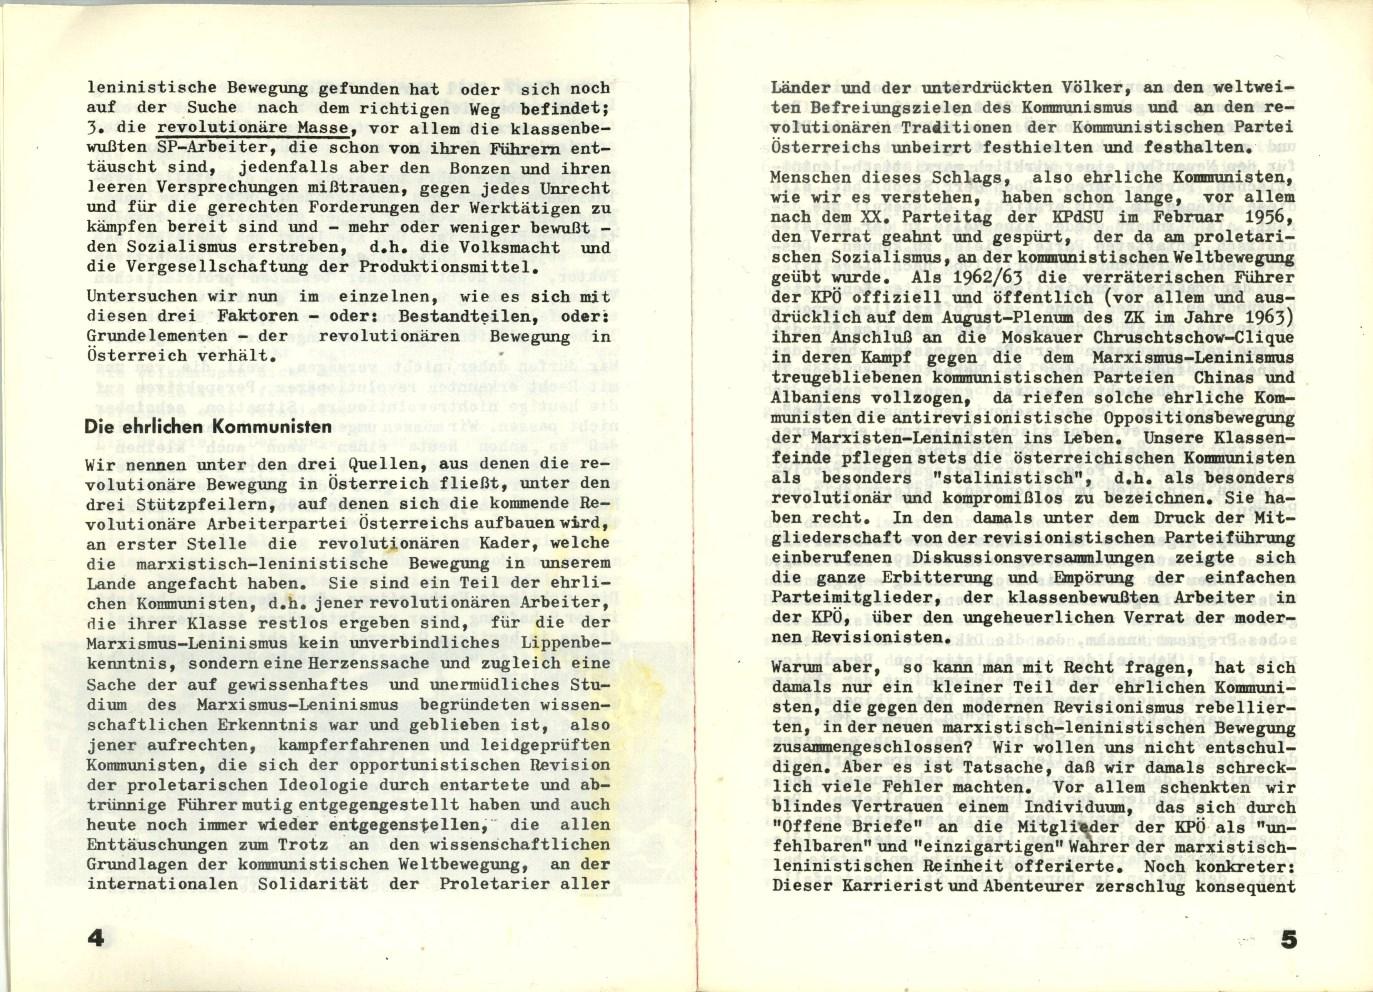 VRA_Perspektiven_1975_04